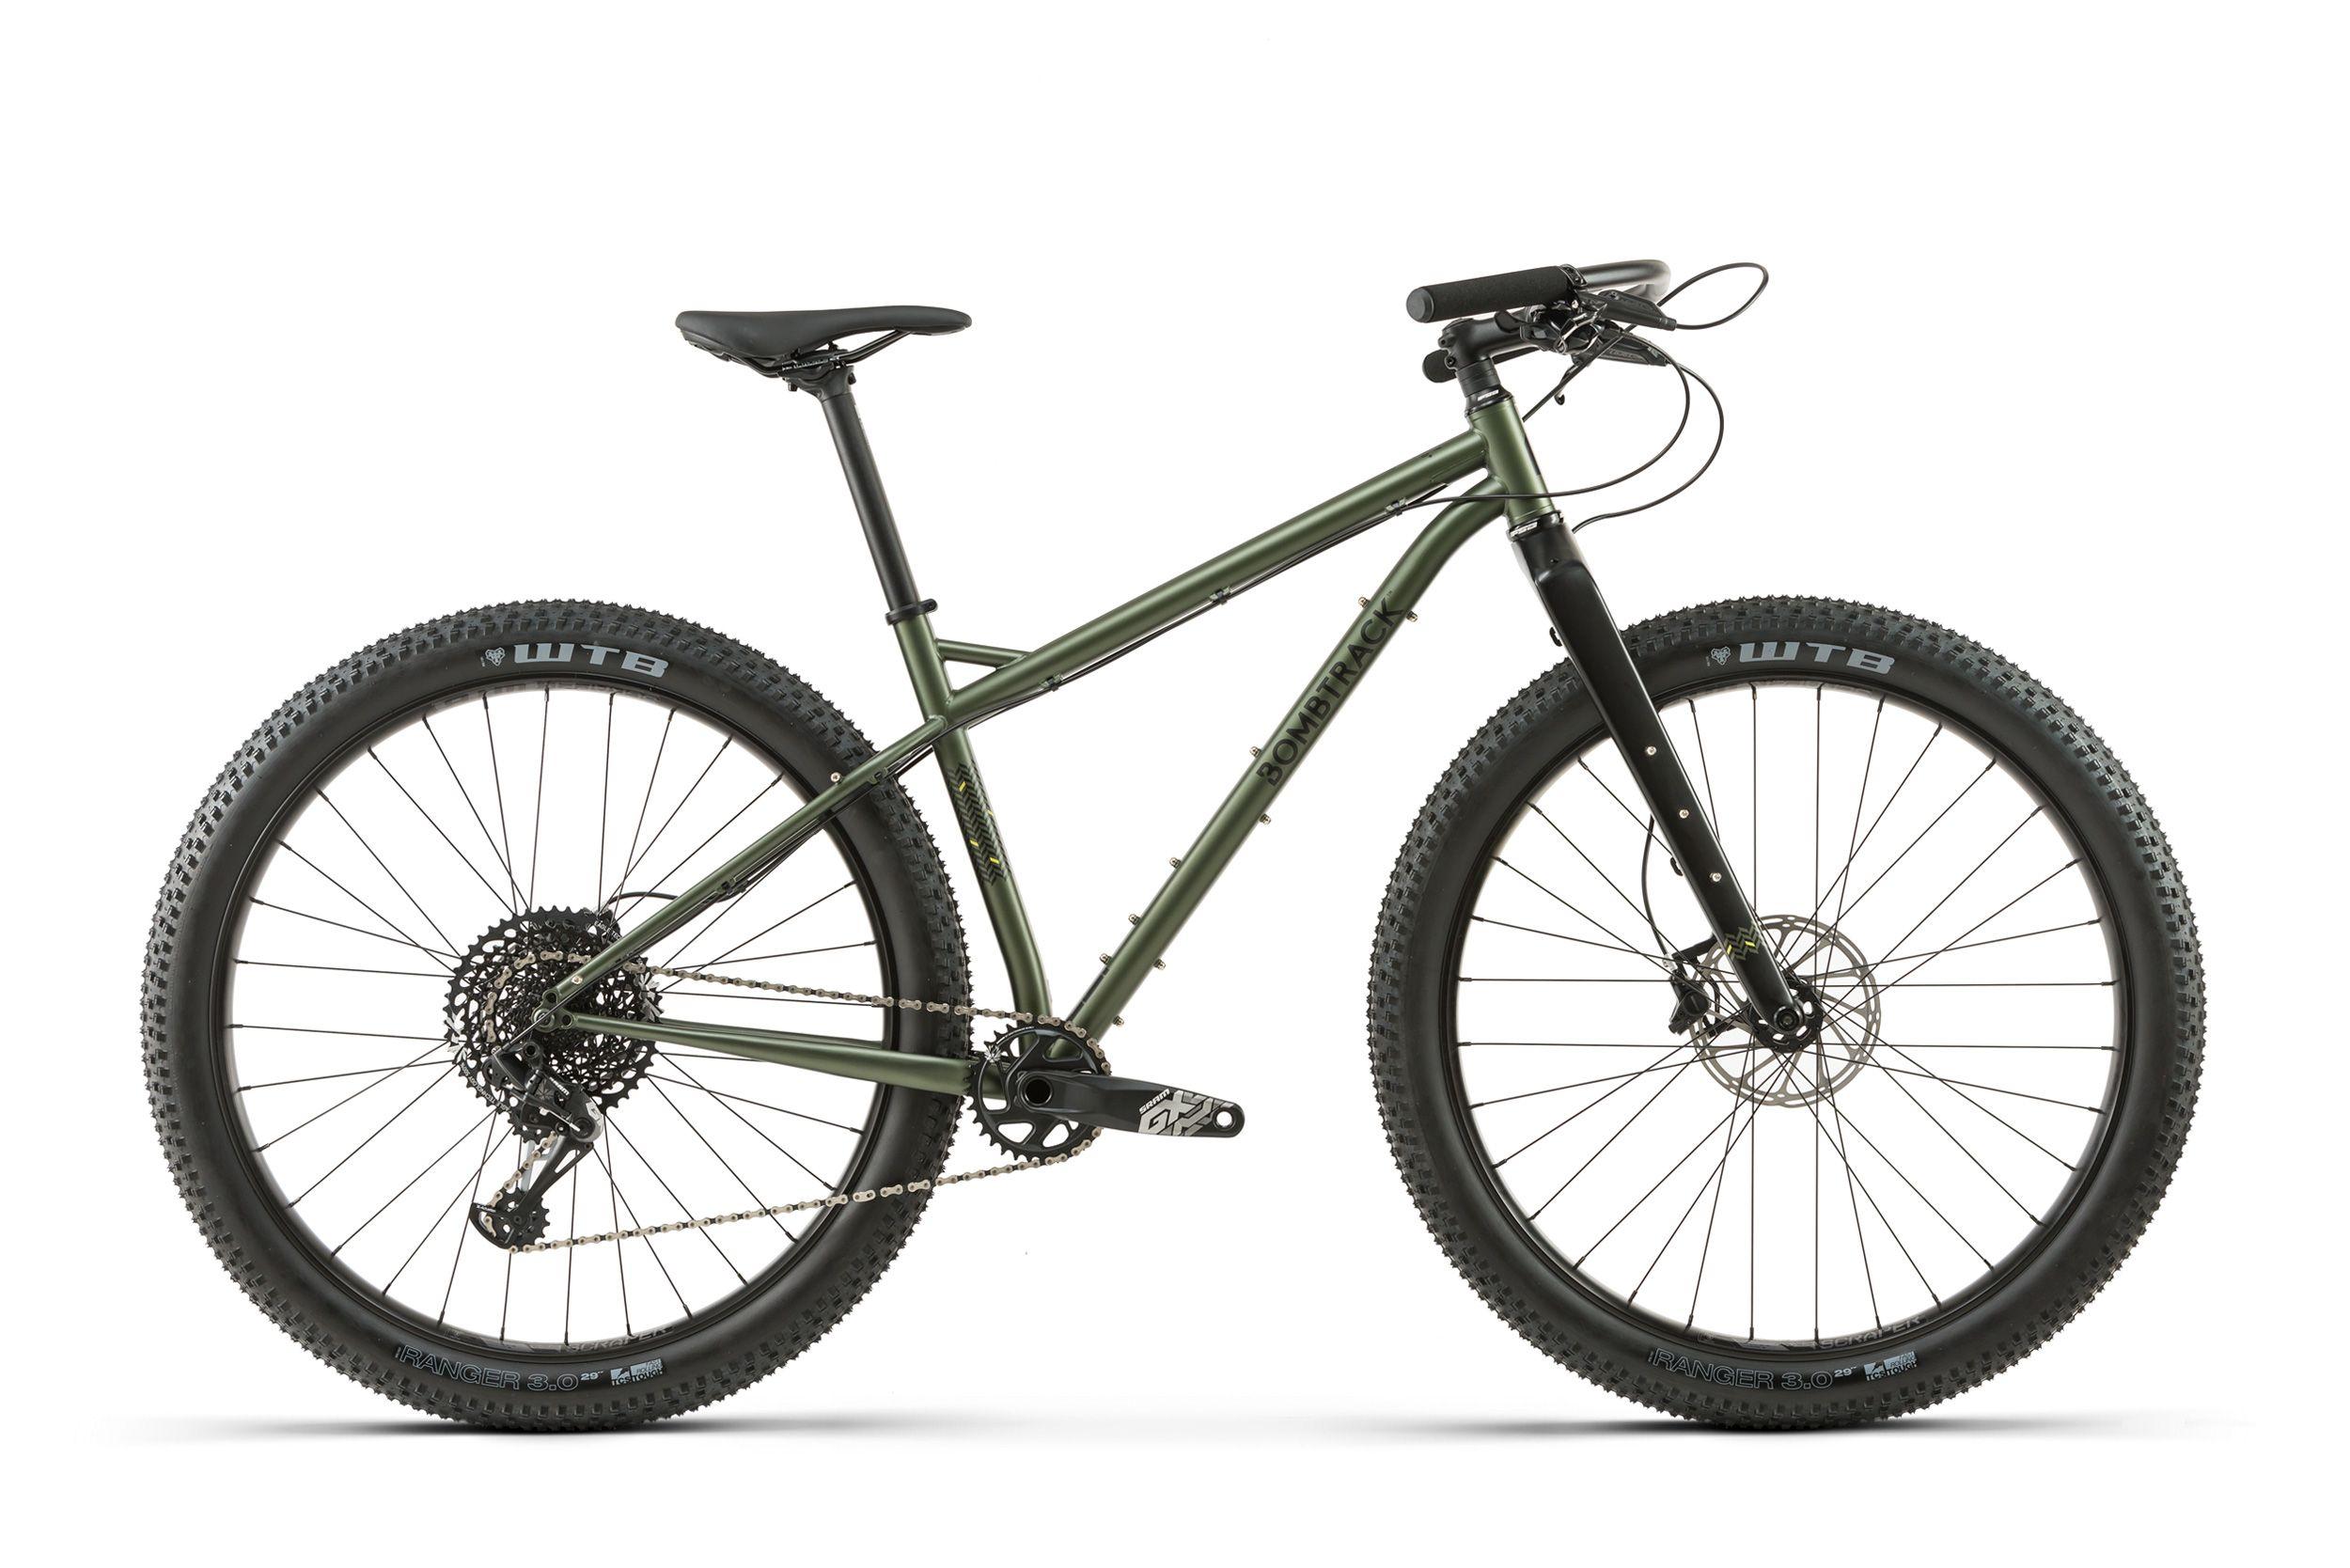 Bombtrack Beyond+ Adv All Road Plus Bike 2019 | Cross